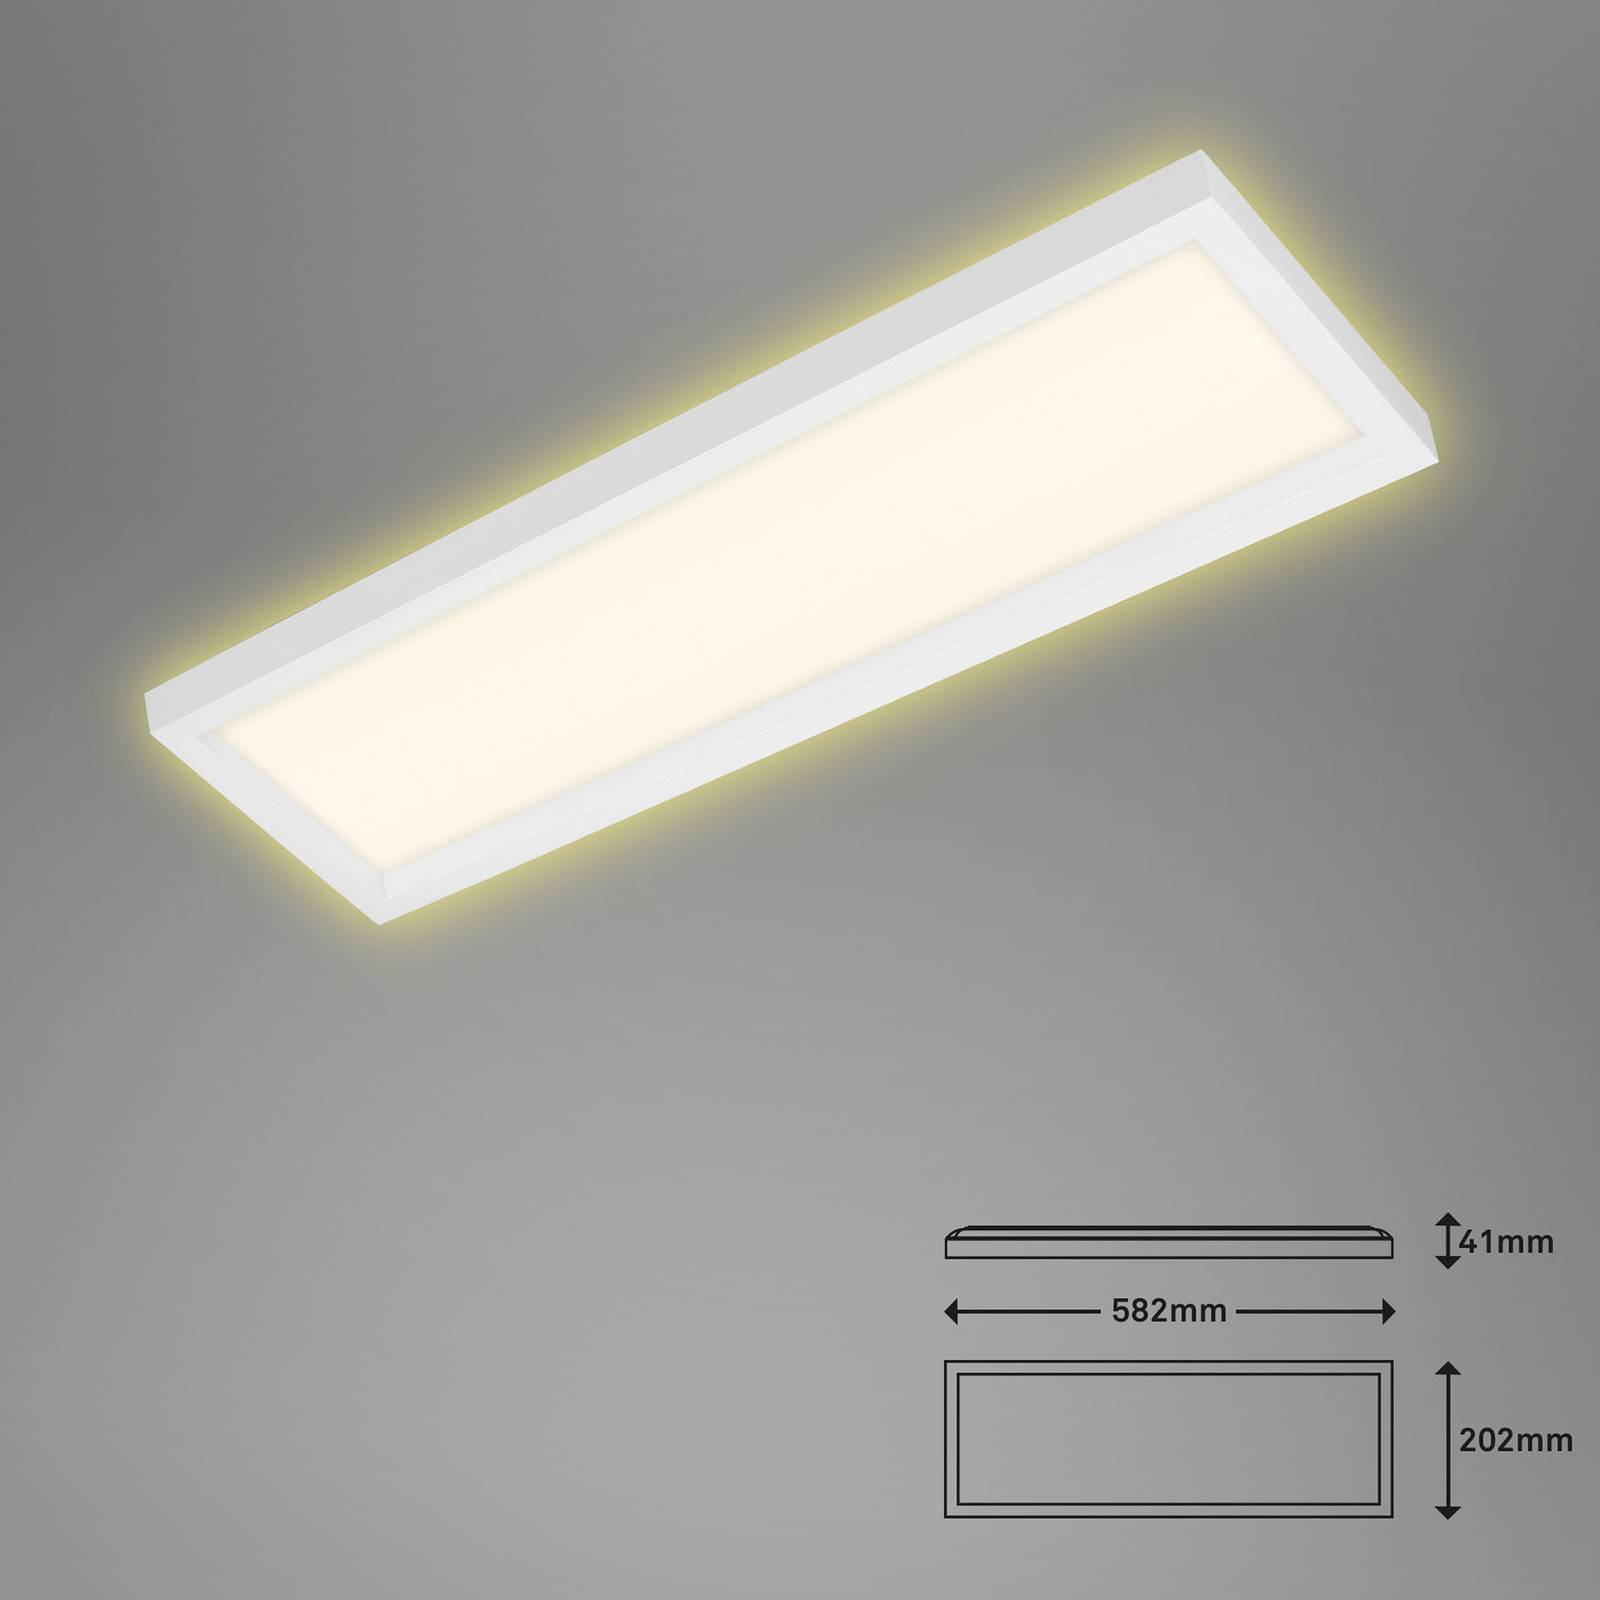 Lampa sufitowa LED 7365, 58 x 20 cm, biała